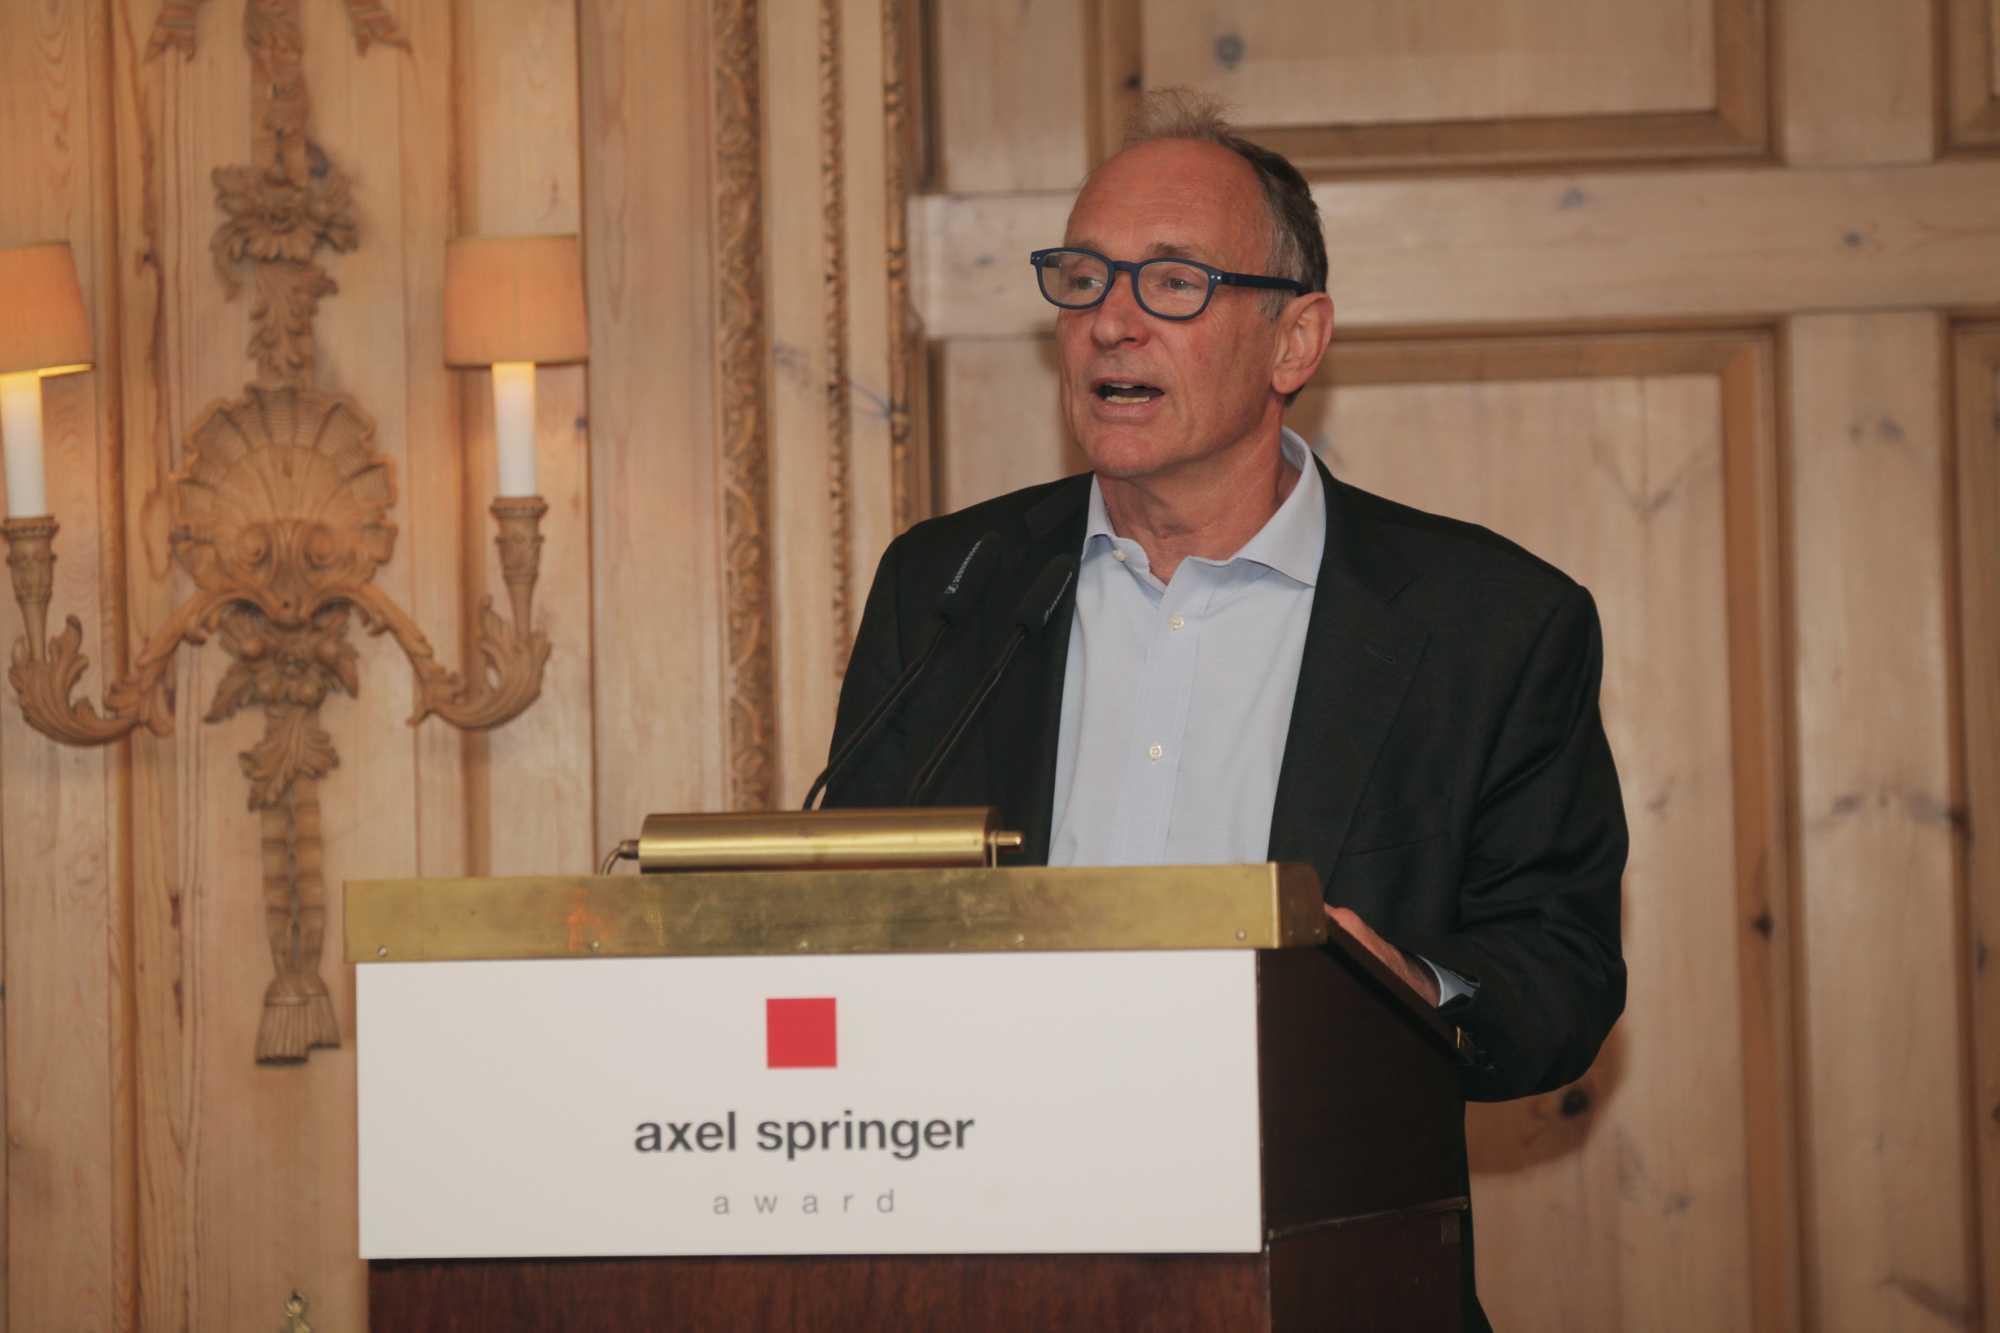 Sir Timothy Berners-Lee während der Verleihung